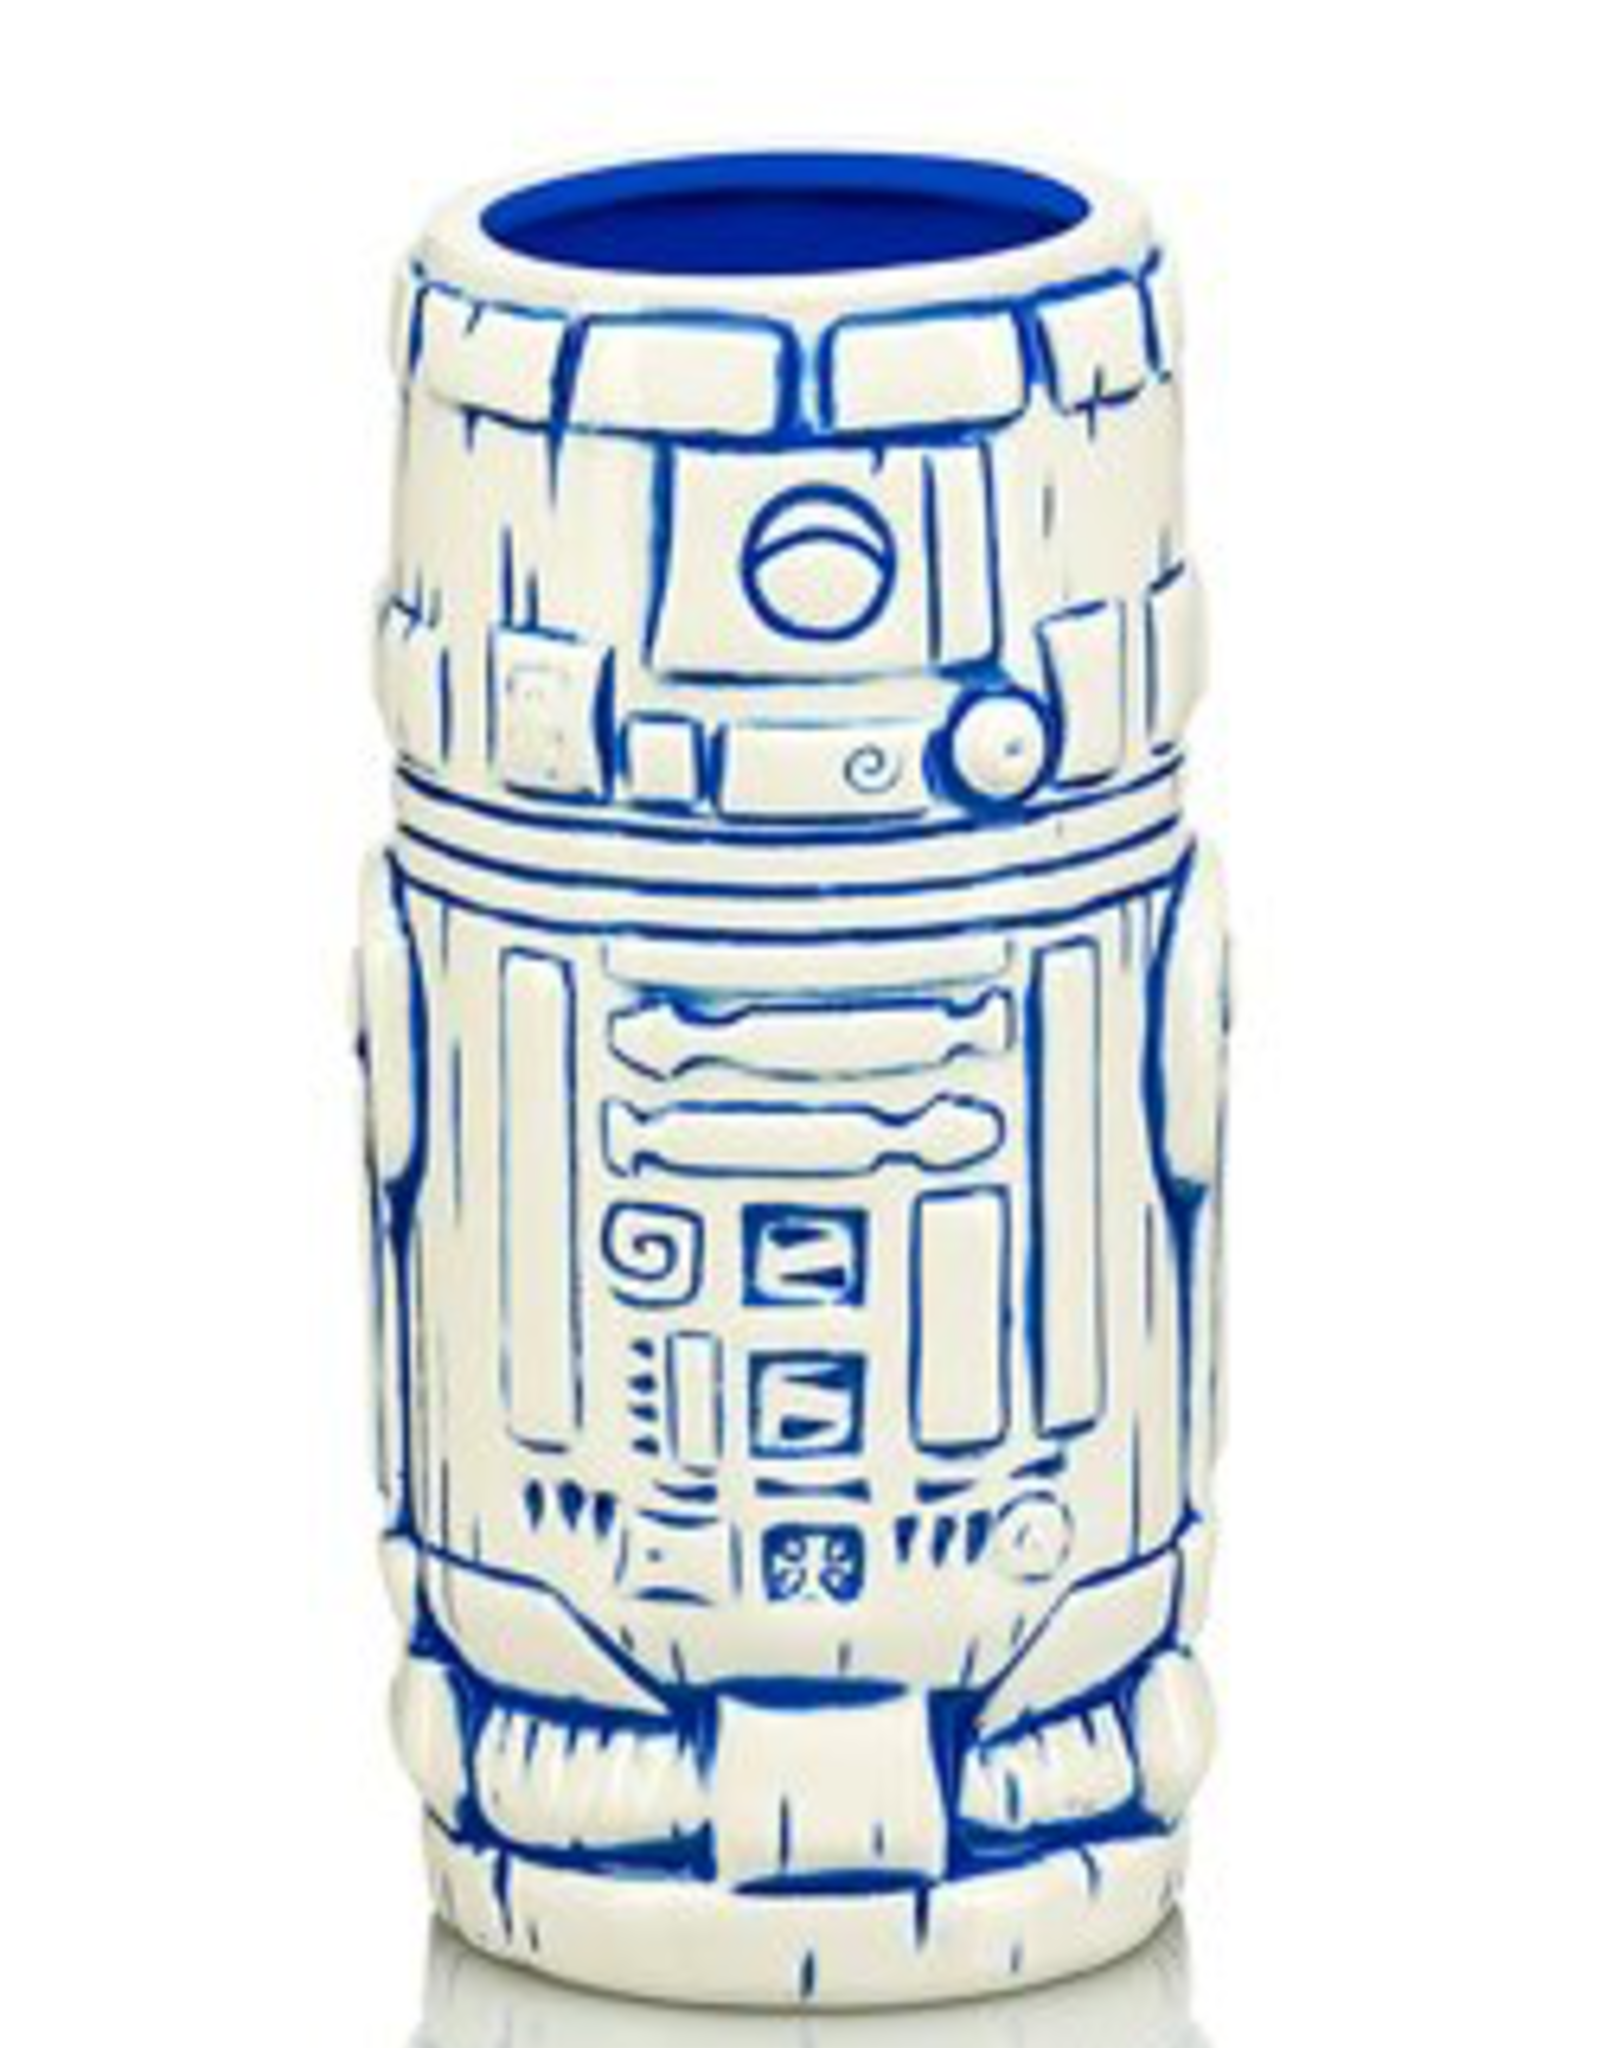 Geeki Tikis - Star Wars R2-D2